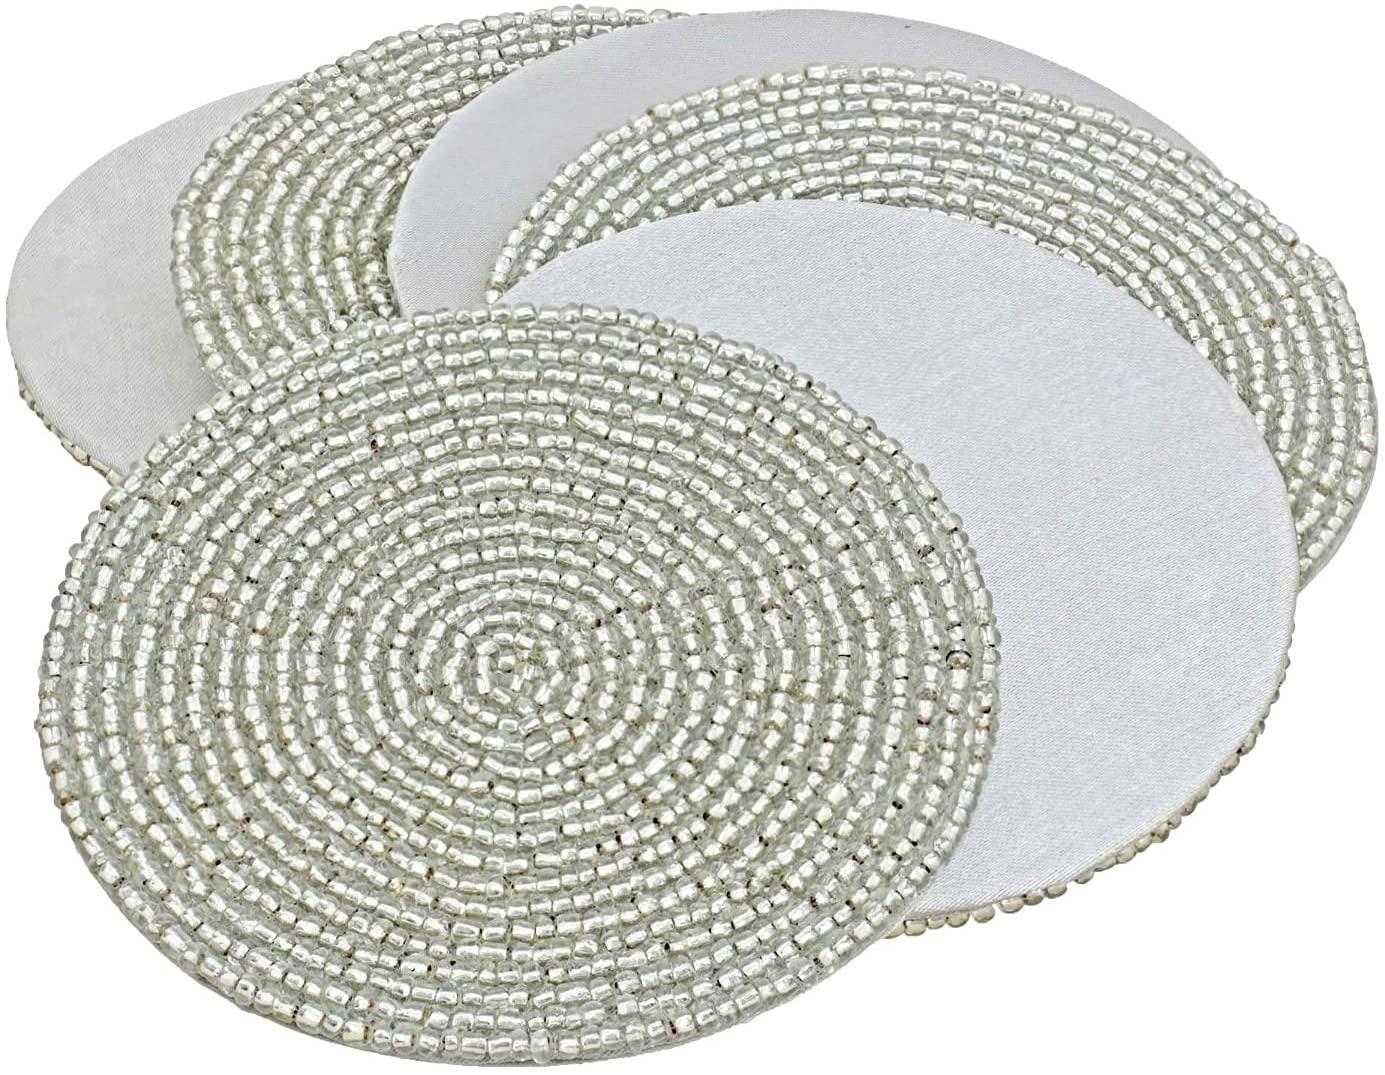 Prisha India Craft Handmade Silver Beaded Tea Coasters Diameter 4